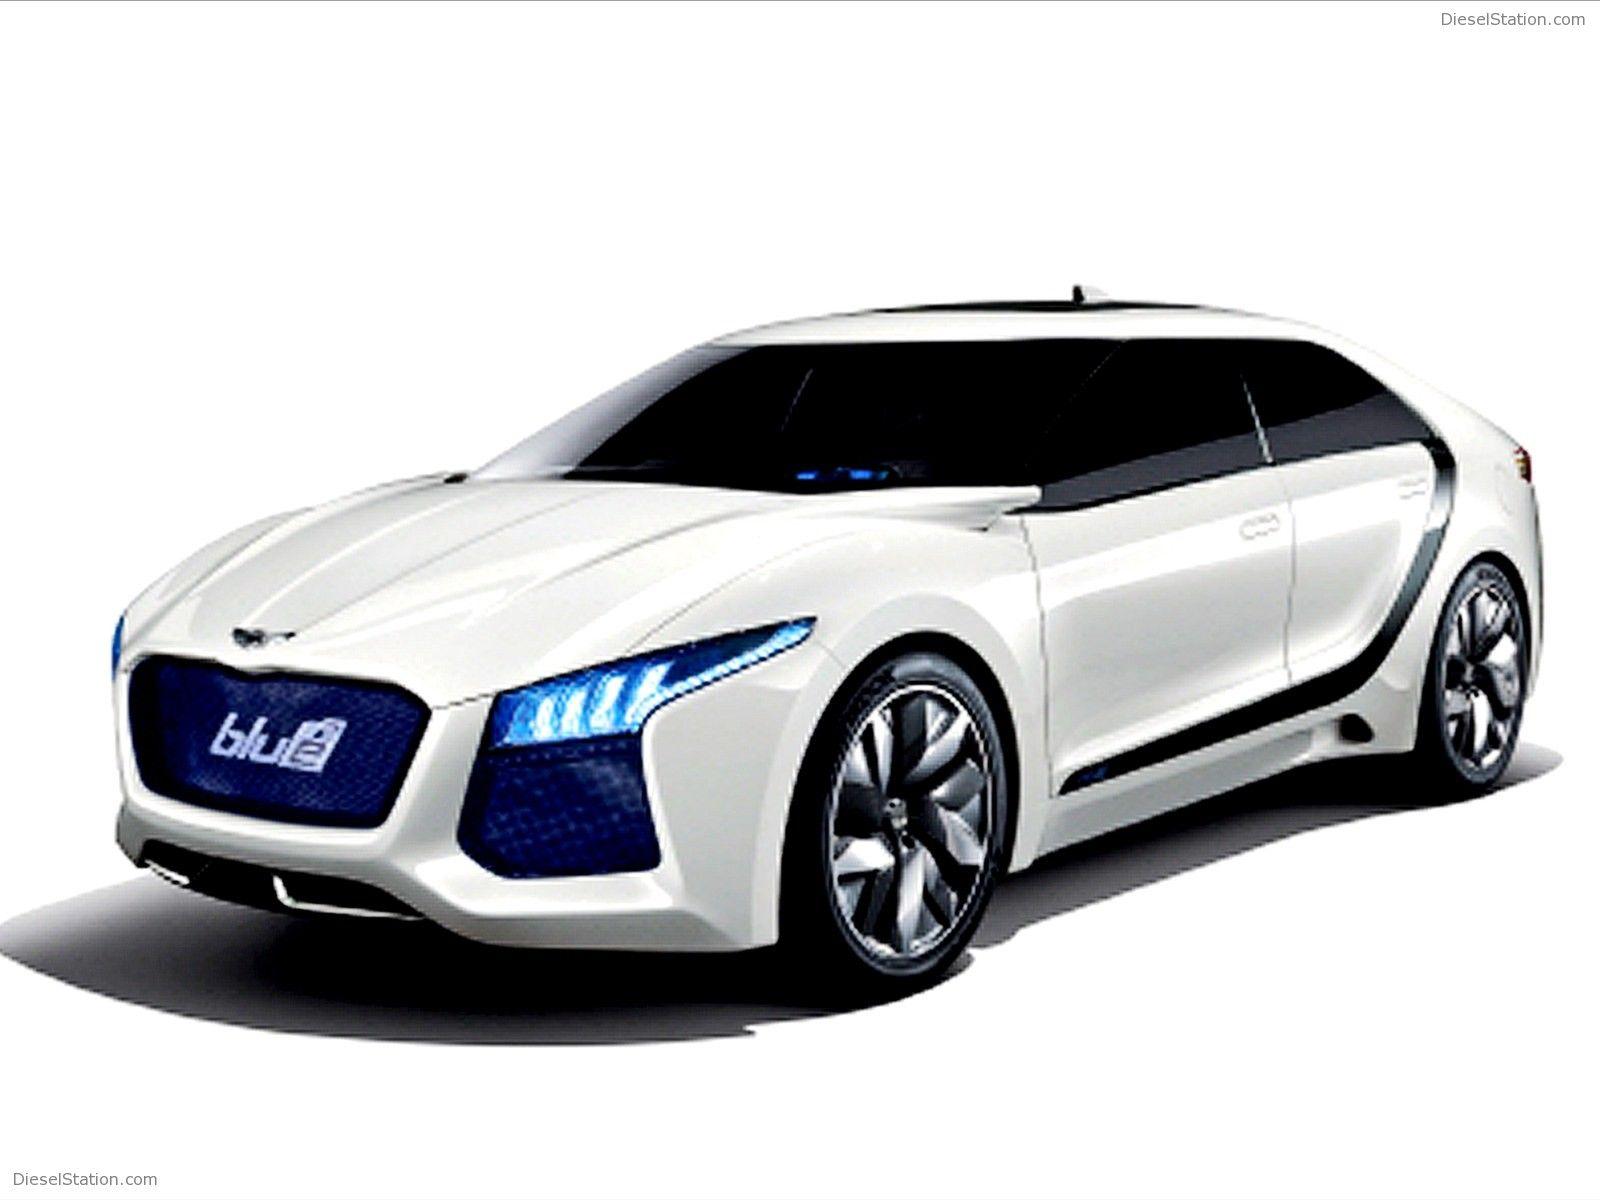 Hyundai Blue2 HND Concept Exotic Car Concept Vehicles